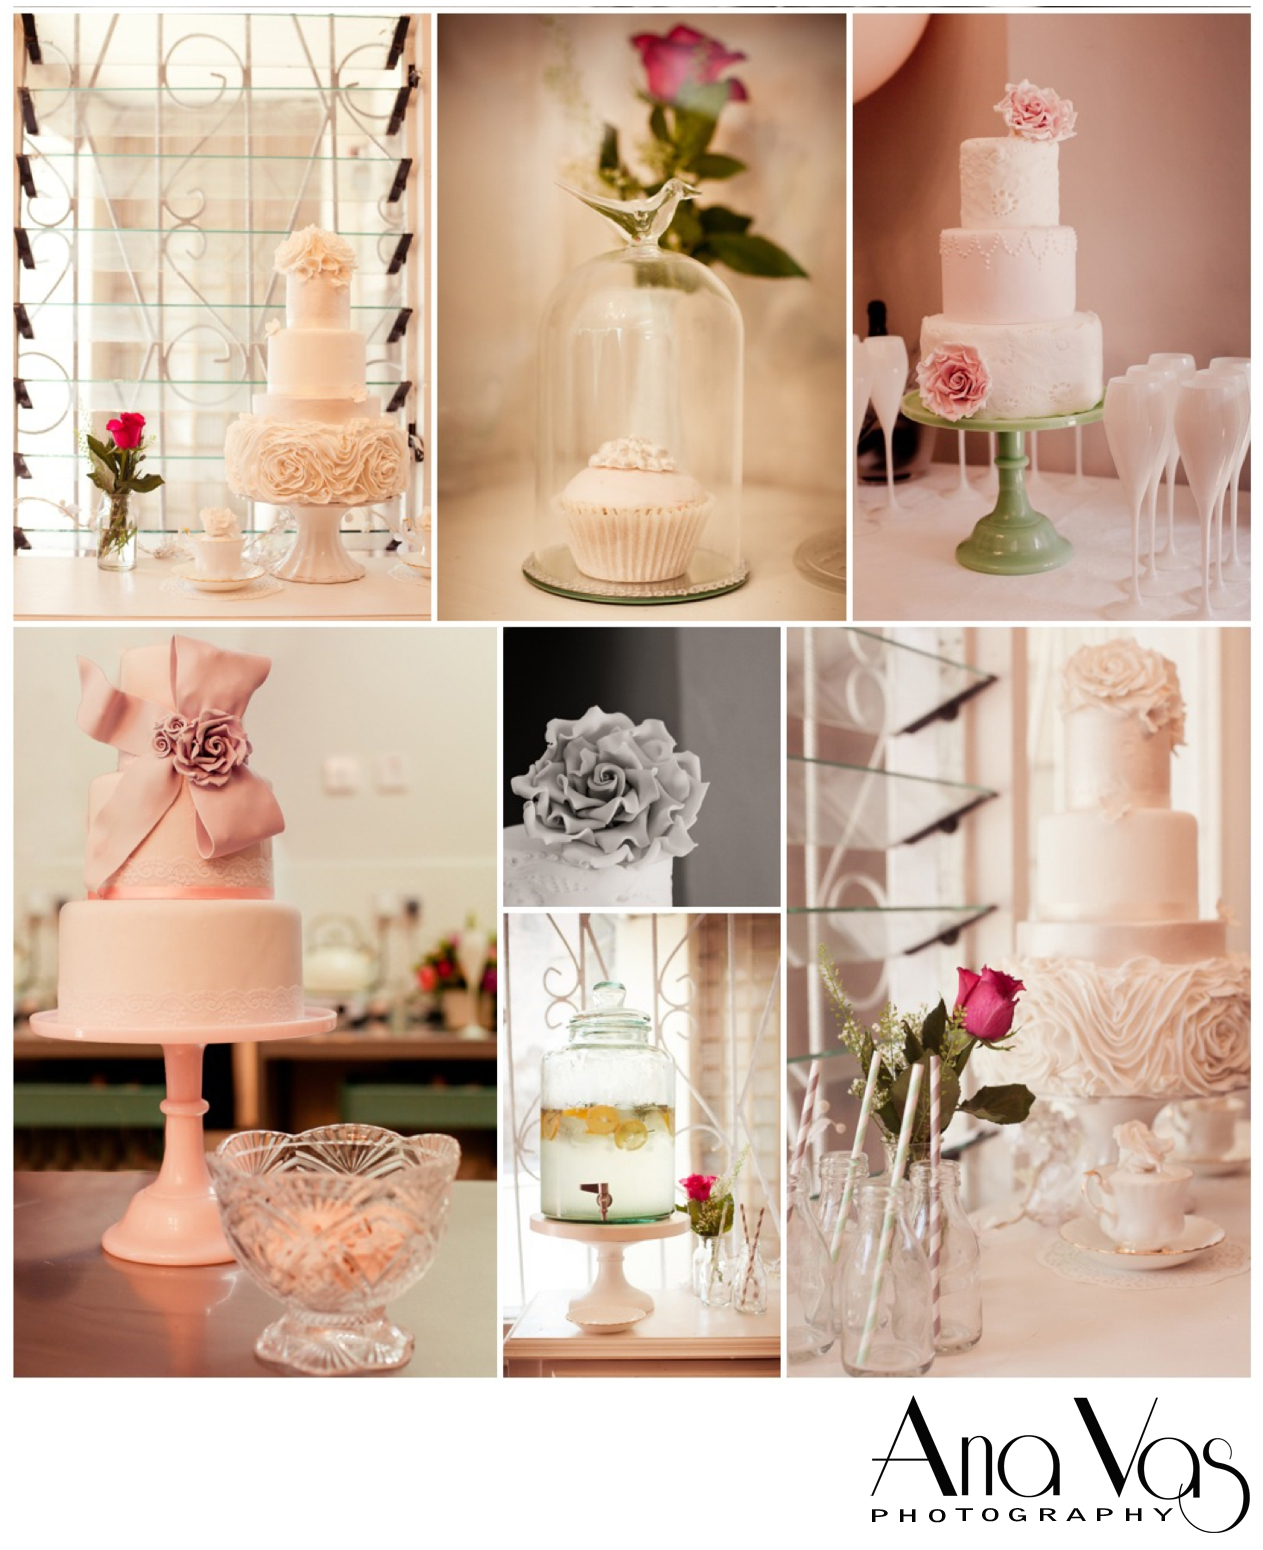 I can finally say, the cakes taste as AMAZING as they look. MMMmmmmmm :)